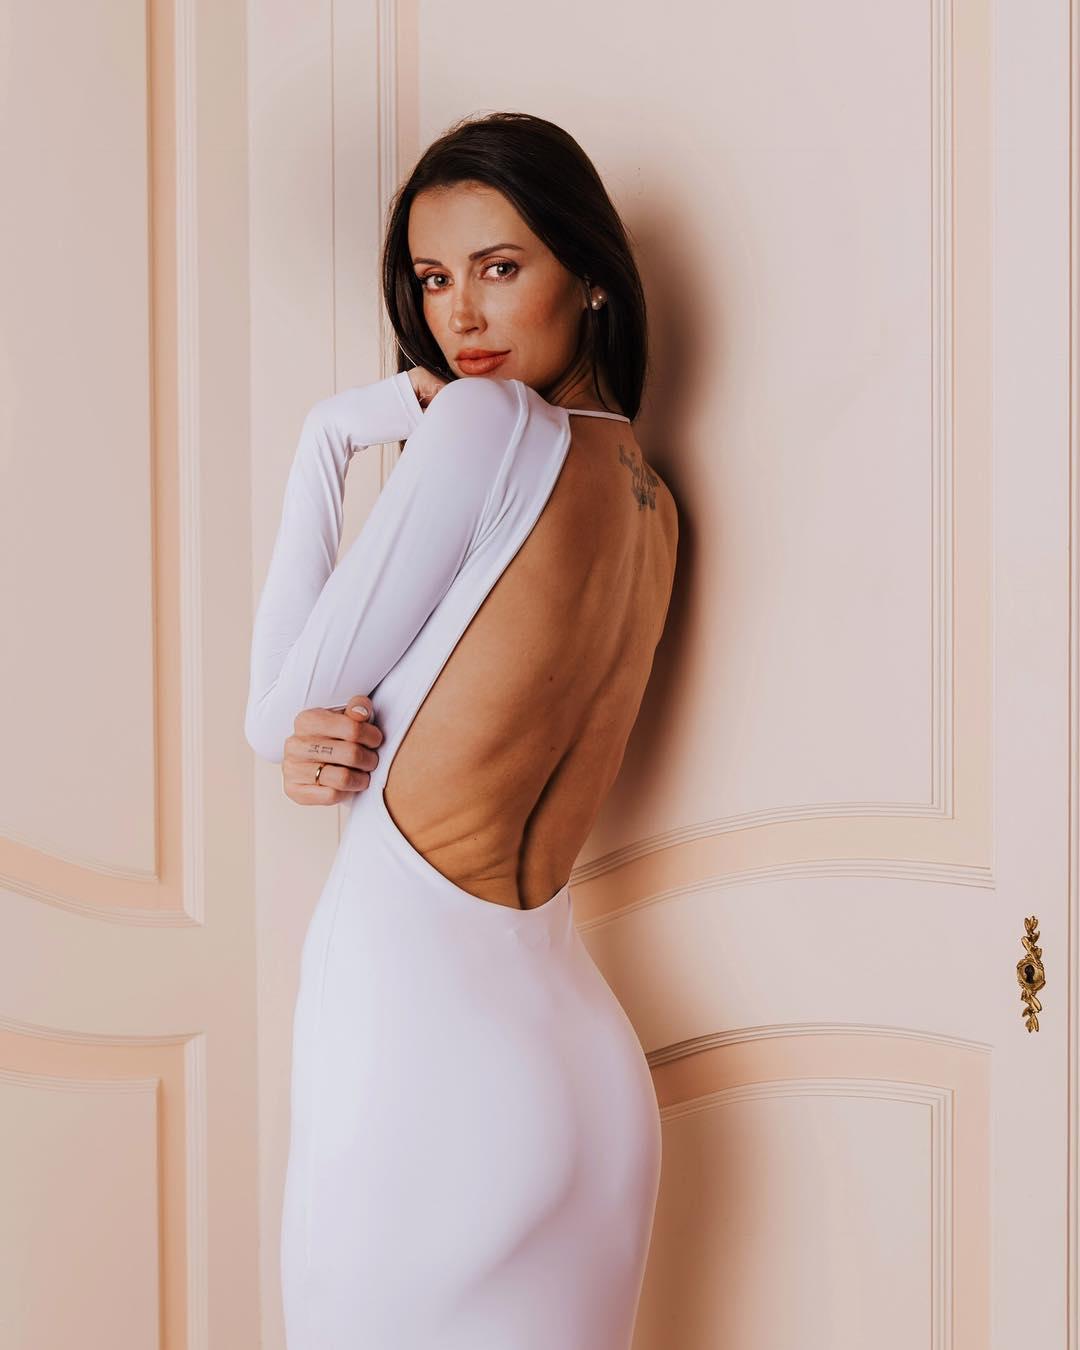 Bianca-Ella-Booth-Wallpapers-Insta-Fit-Bio-9